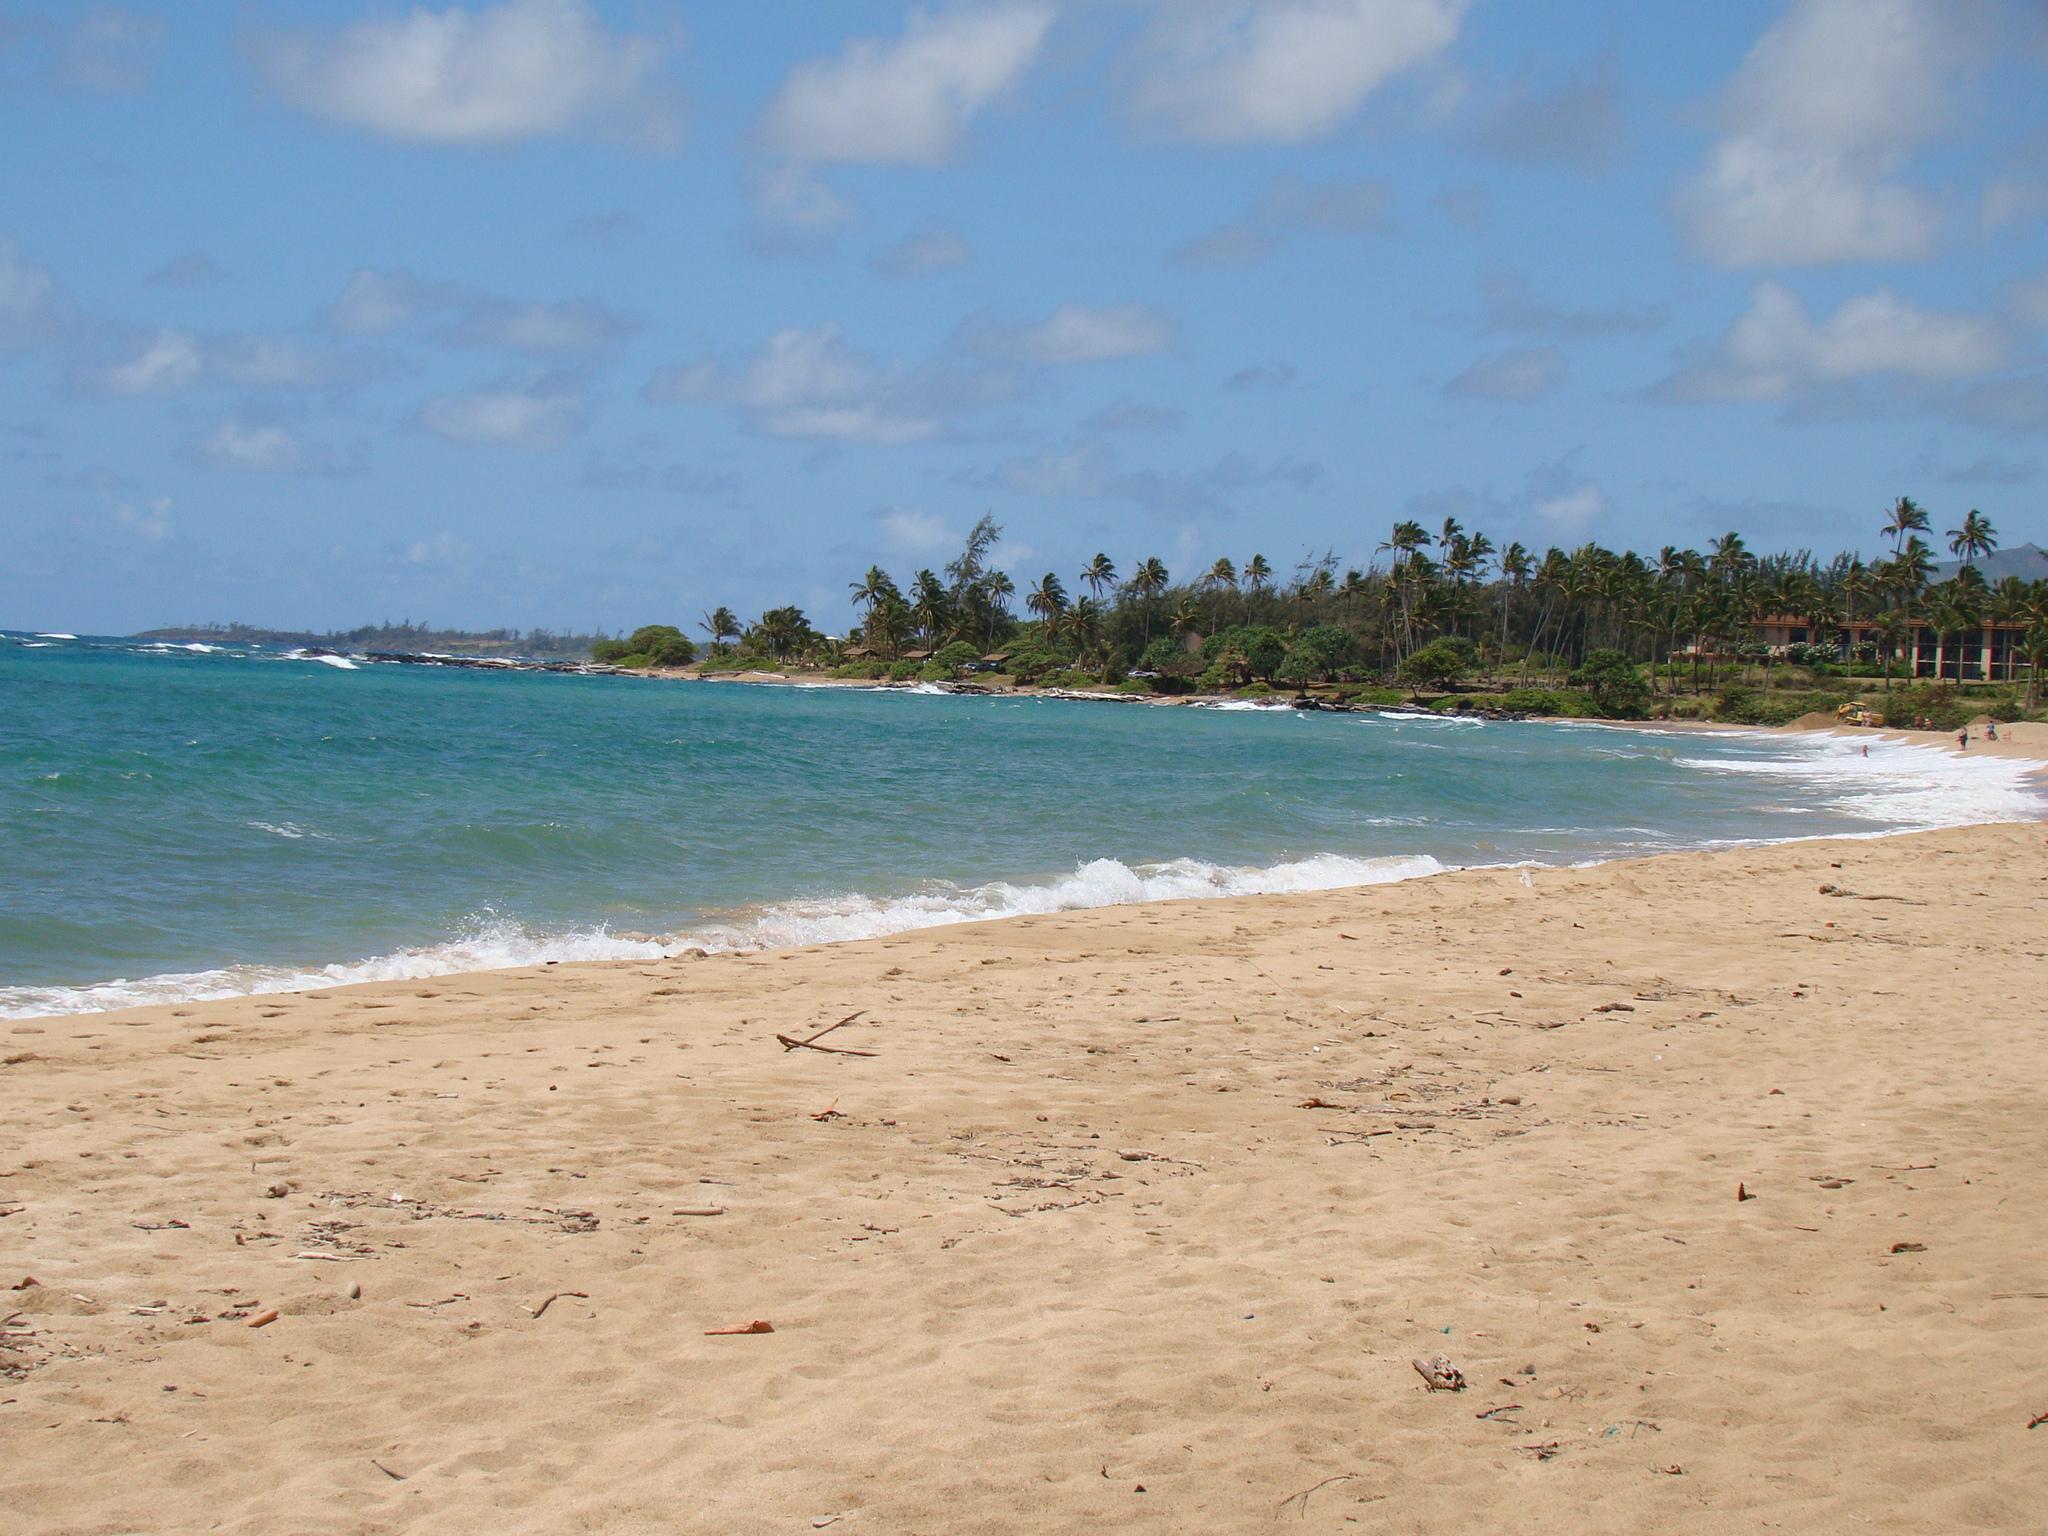 South End Wailua Beach